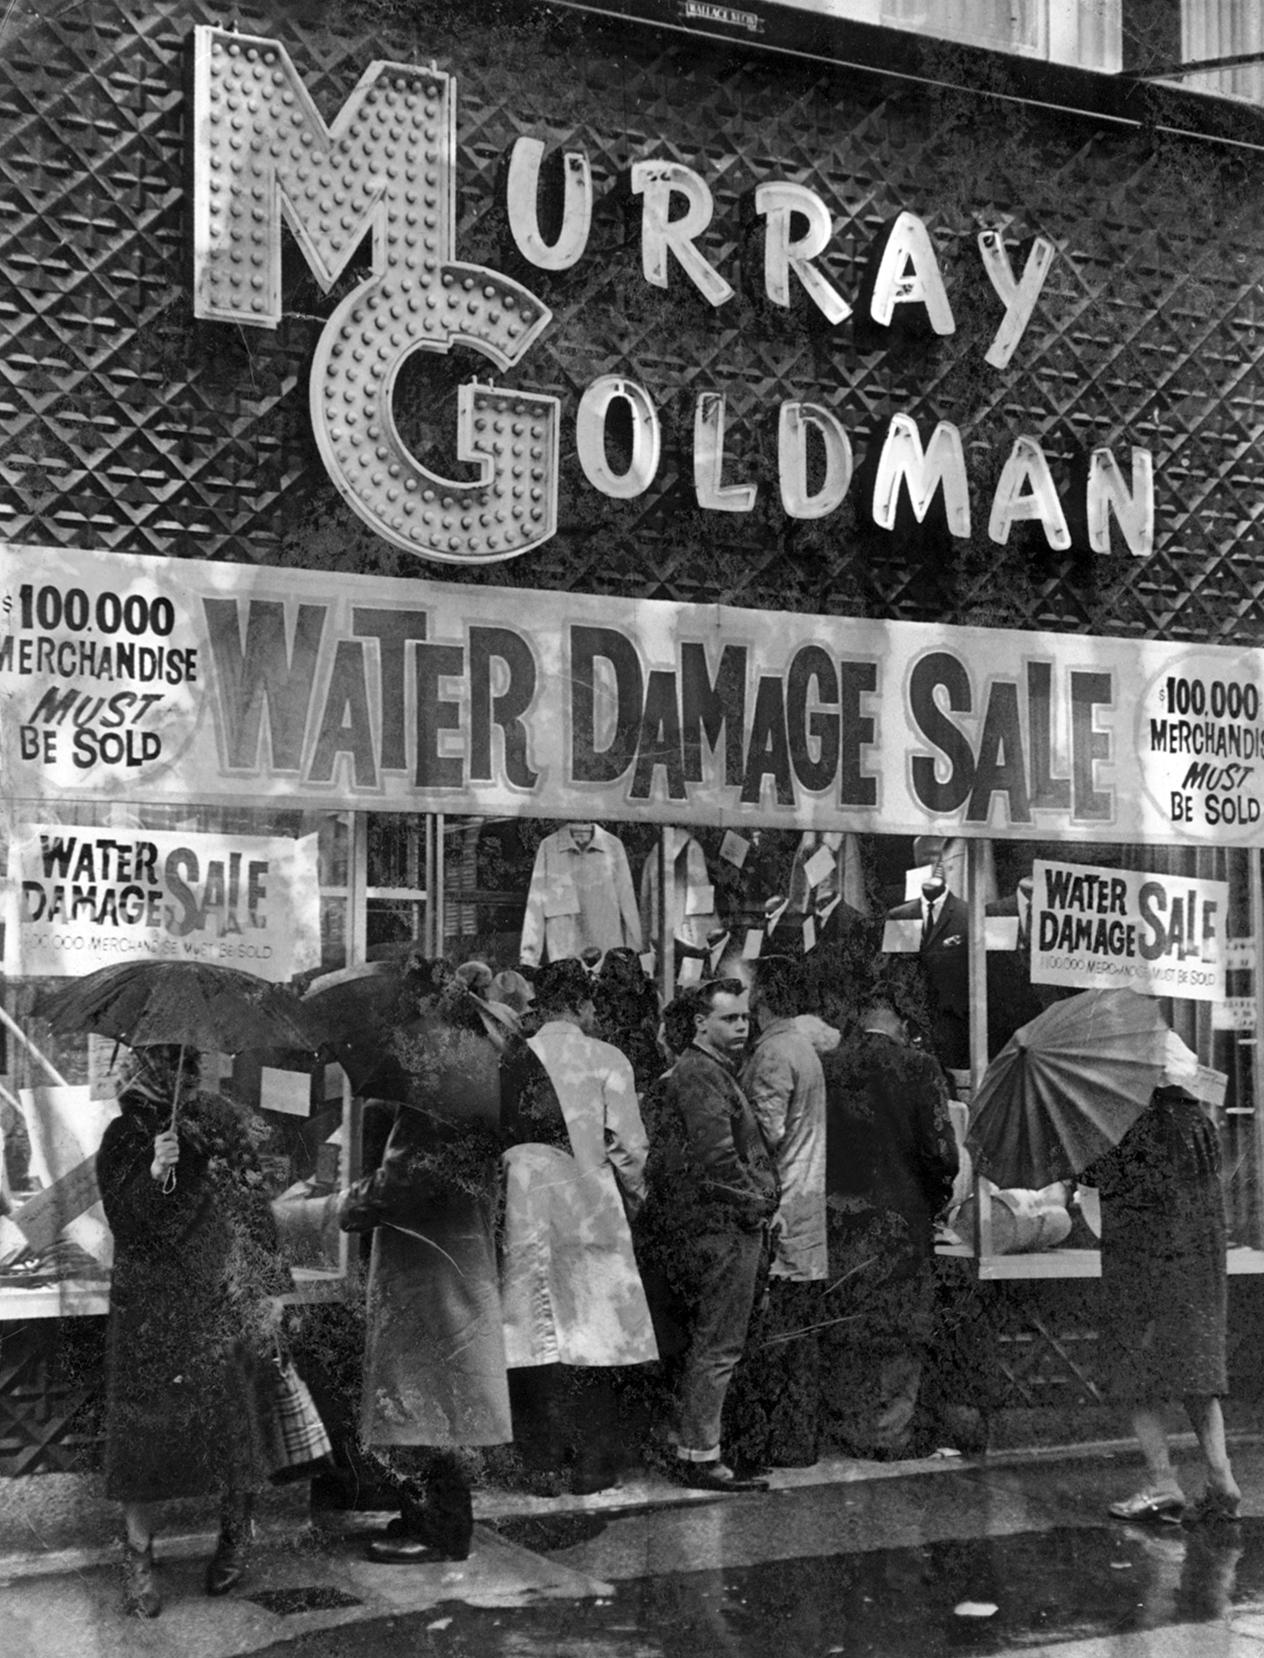 Murray Goldman Menswear was founded in 1946. Photo:  www.thedigitalpanda.com